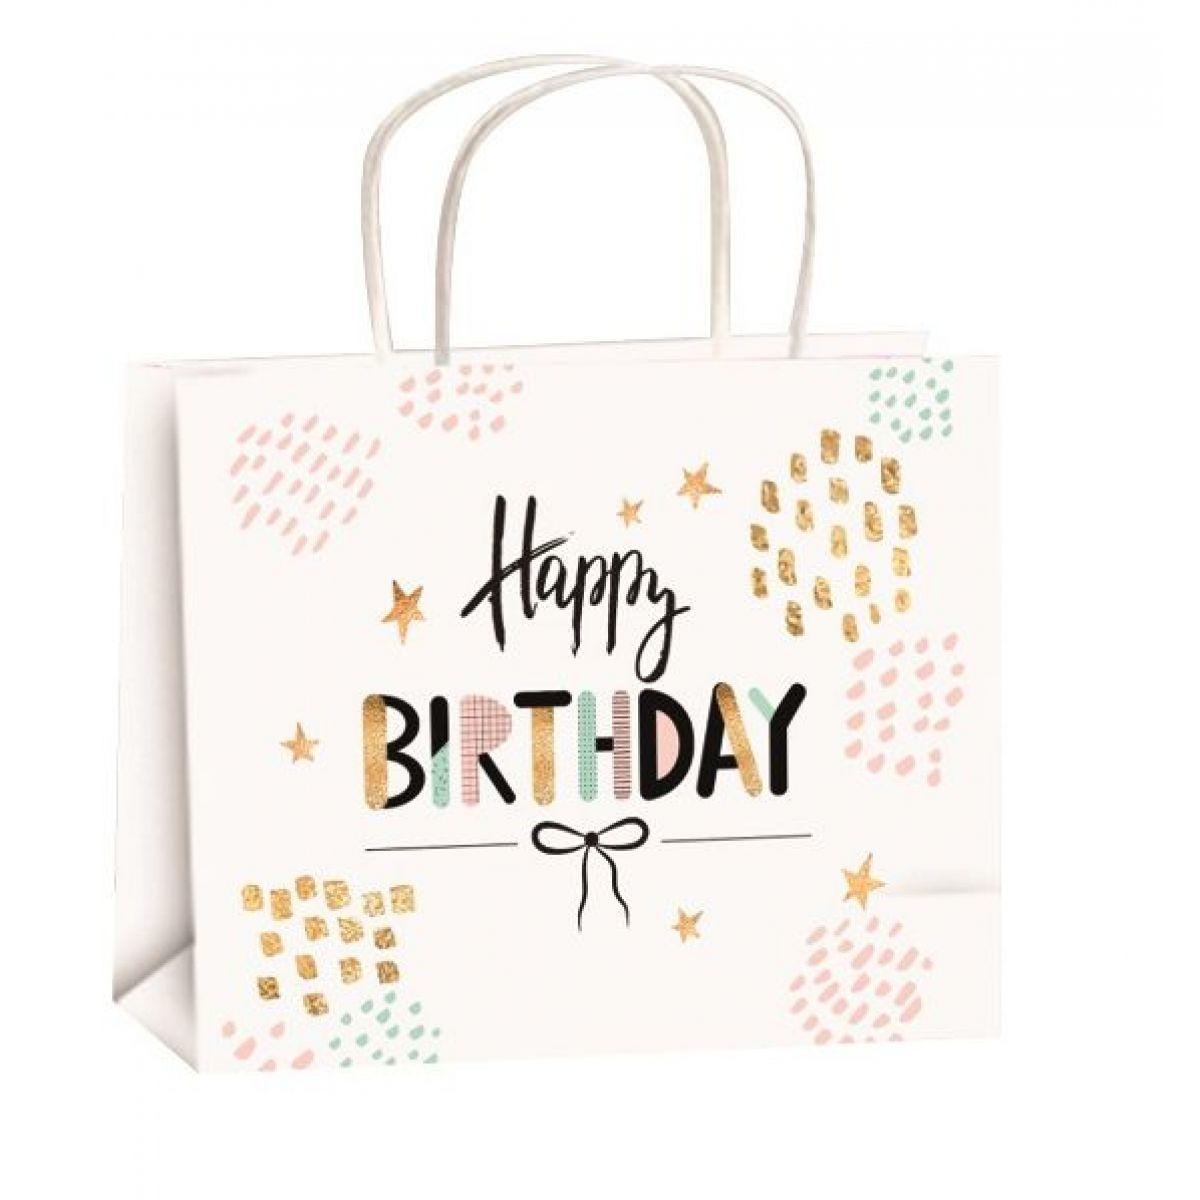 Taška narozeninová zlatá ražba M horizont 23x18x10cm Happy Birthday